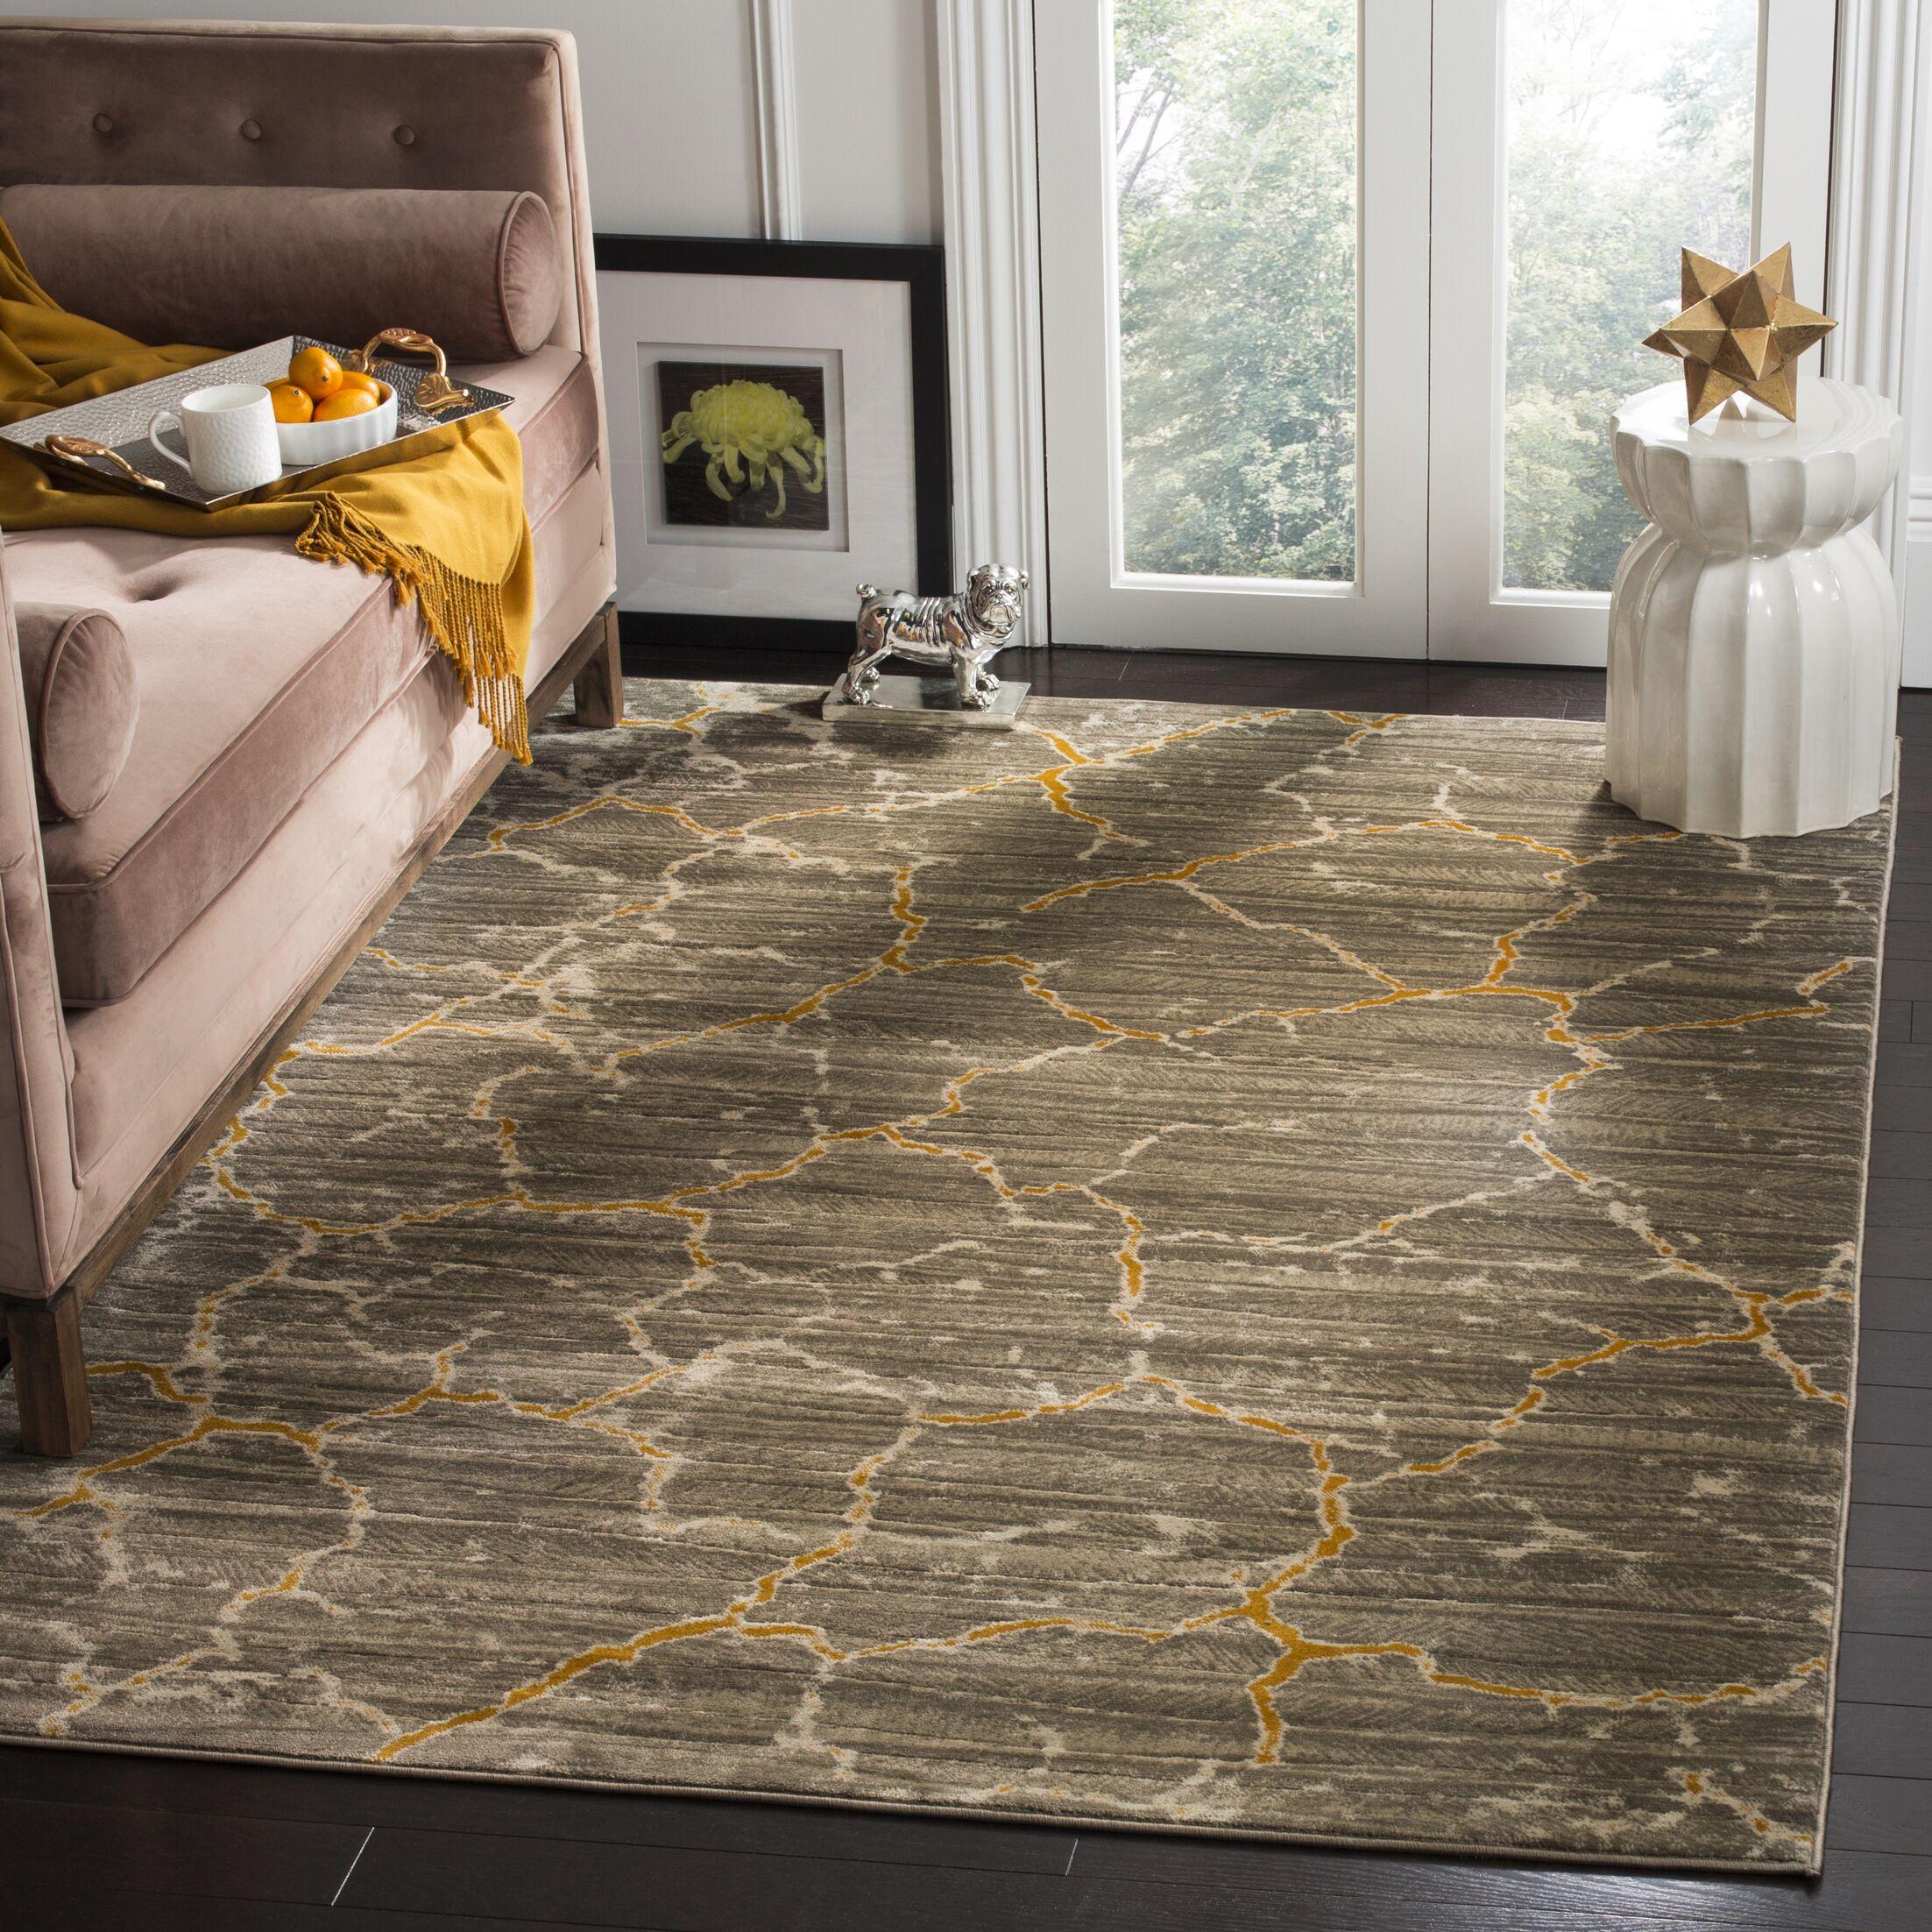 Sorrentino Dark grey/Yellow Area Rug Rug Size: Square 6'7